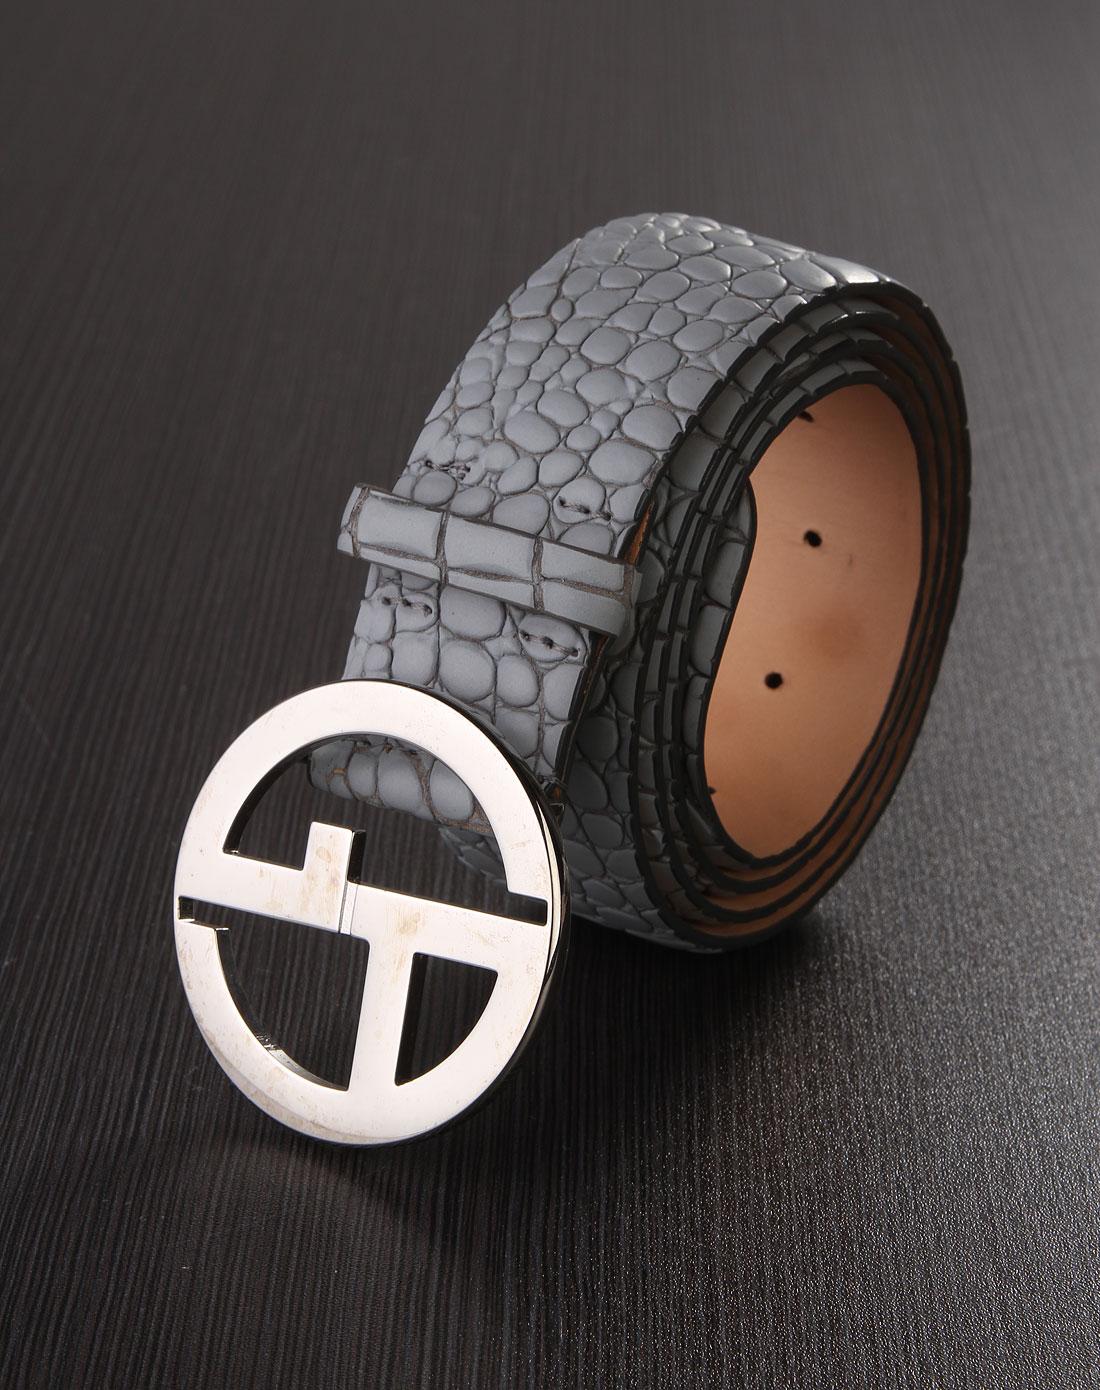 ga女款奢华经典logo金属扣蛇皮纹皮带灰色